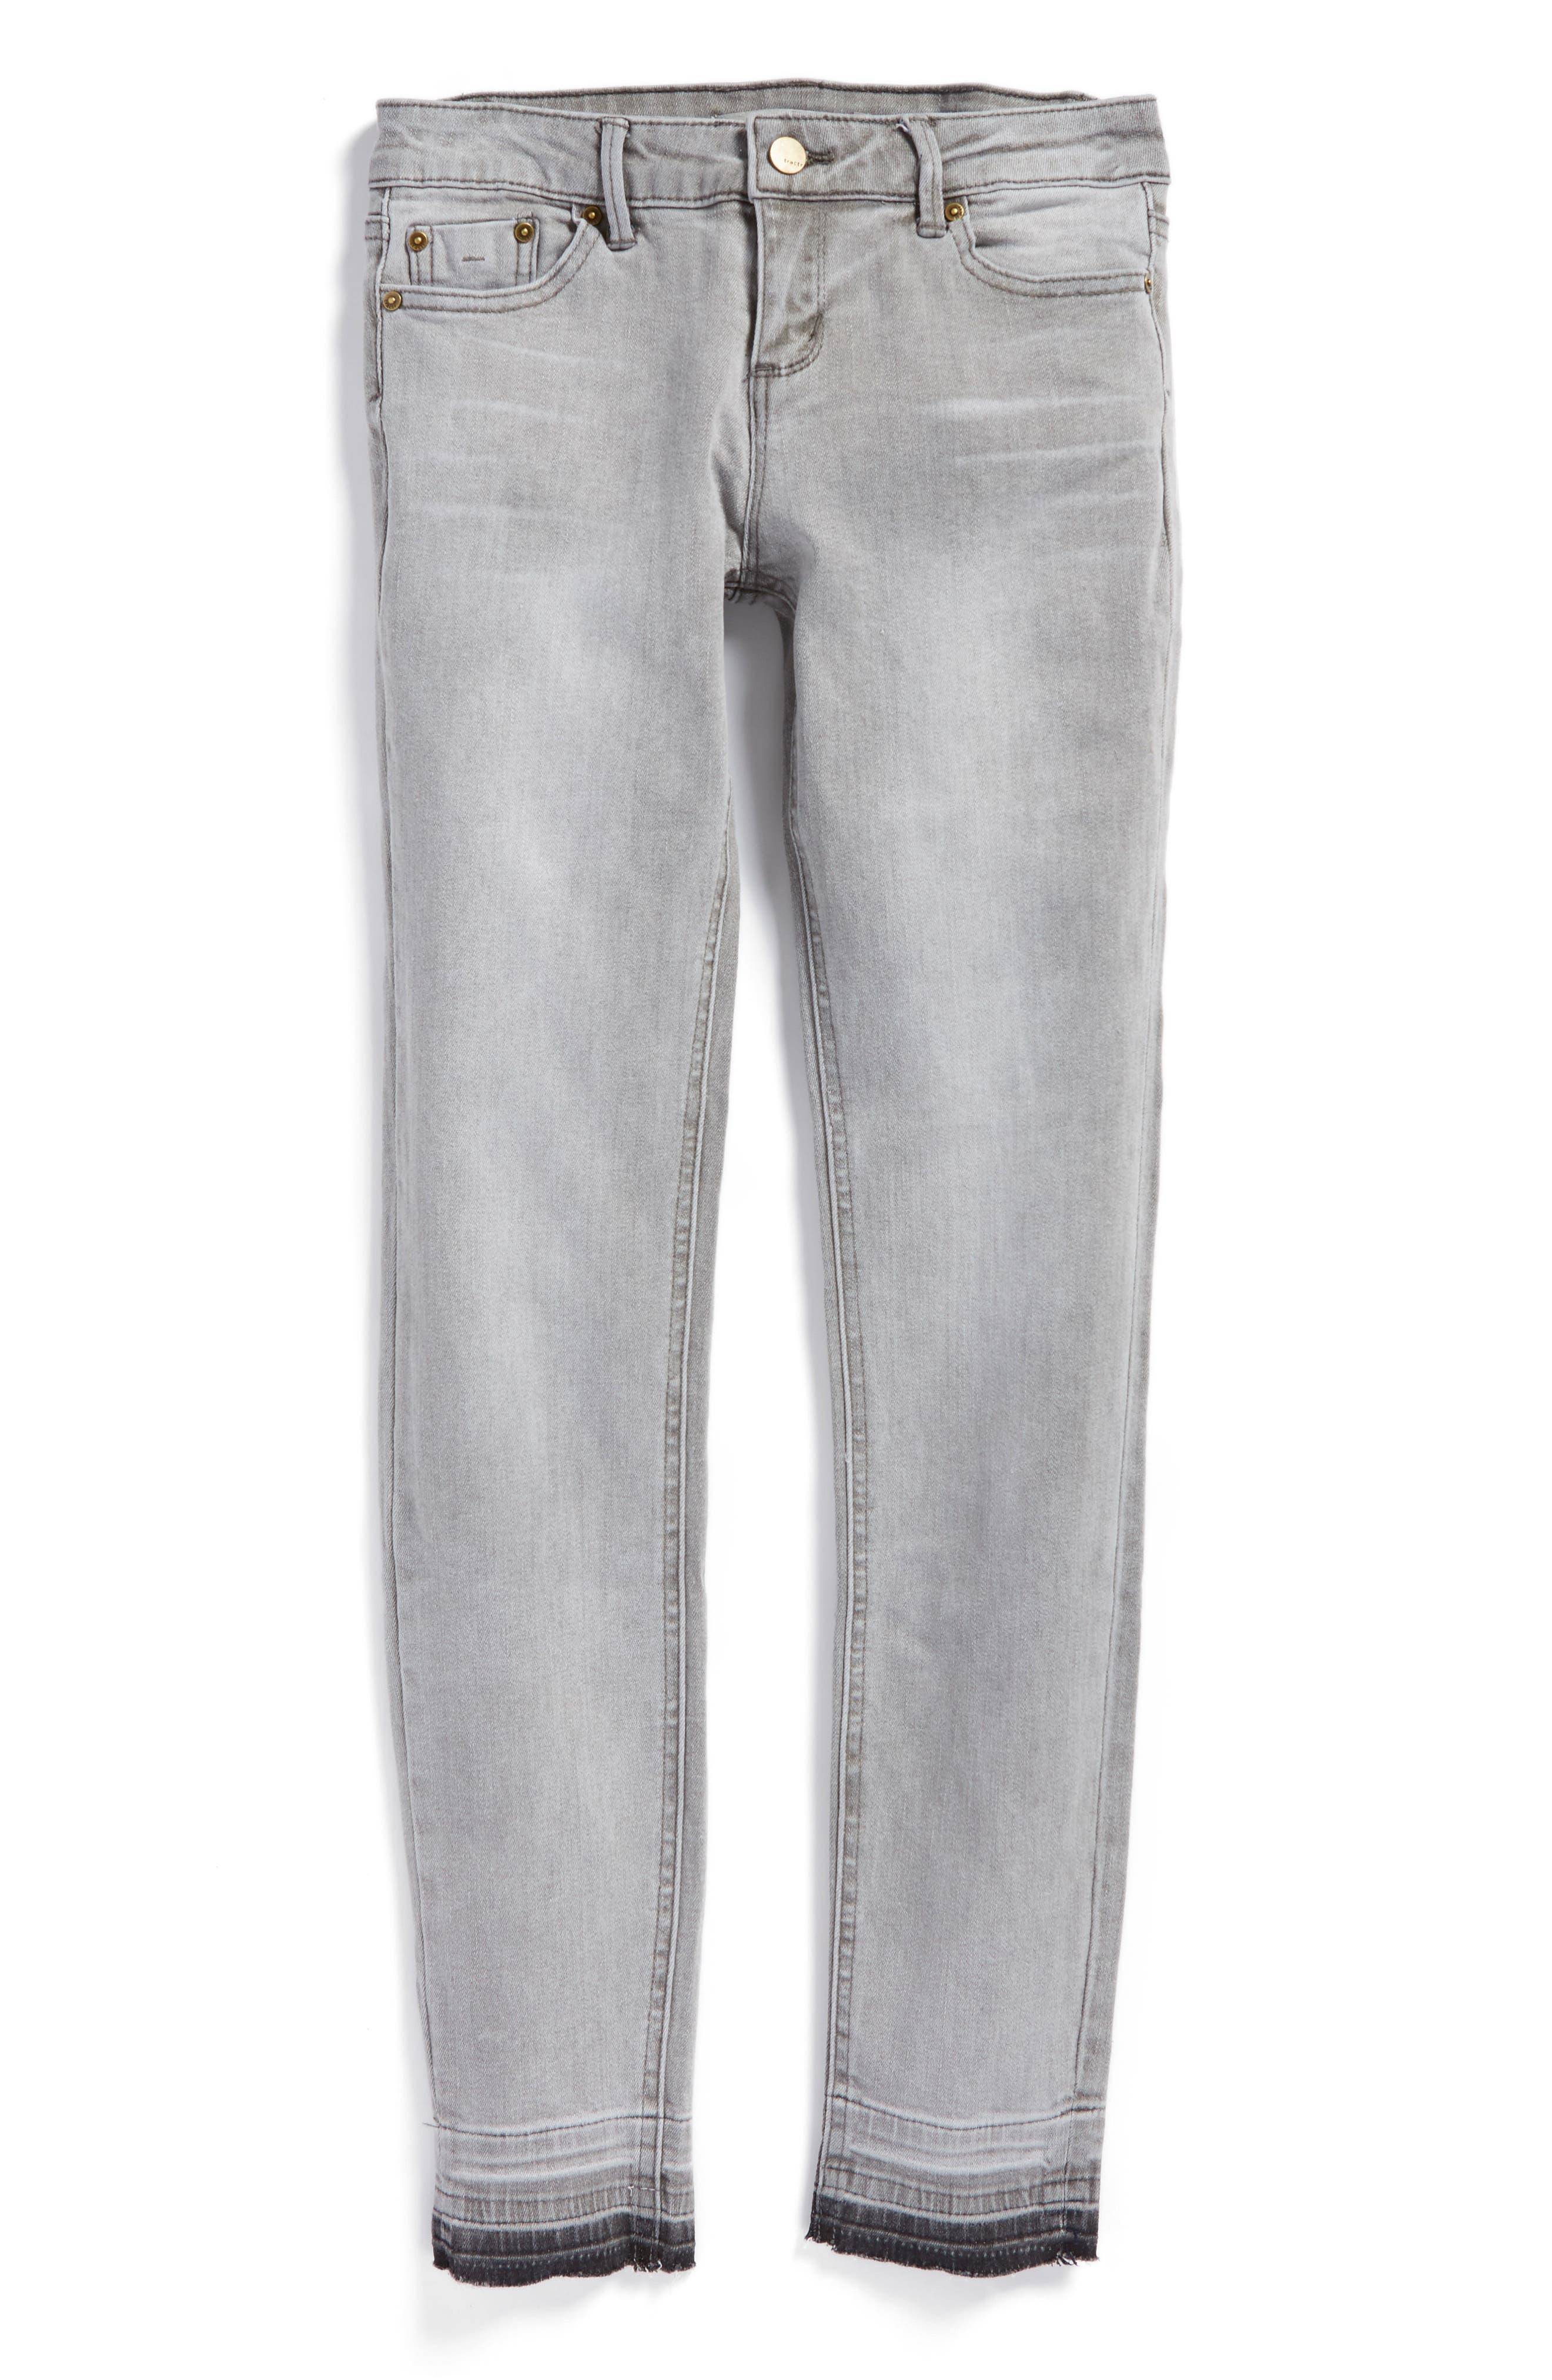 Alternate Image 1 Selected - Tractr Release Hem Skinny Jeans (Big Girls)